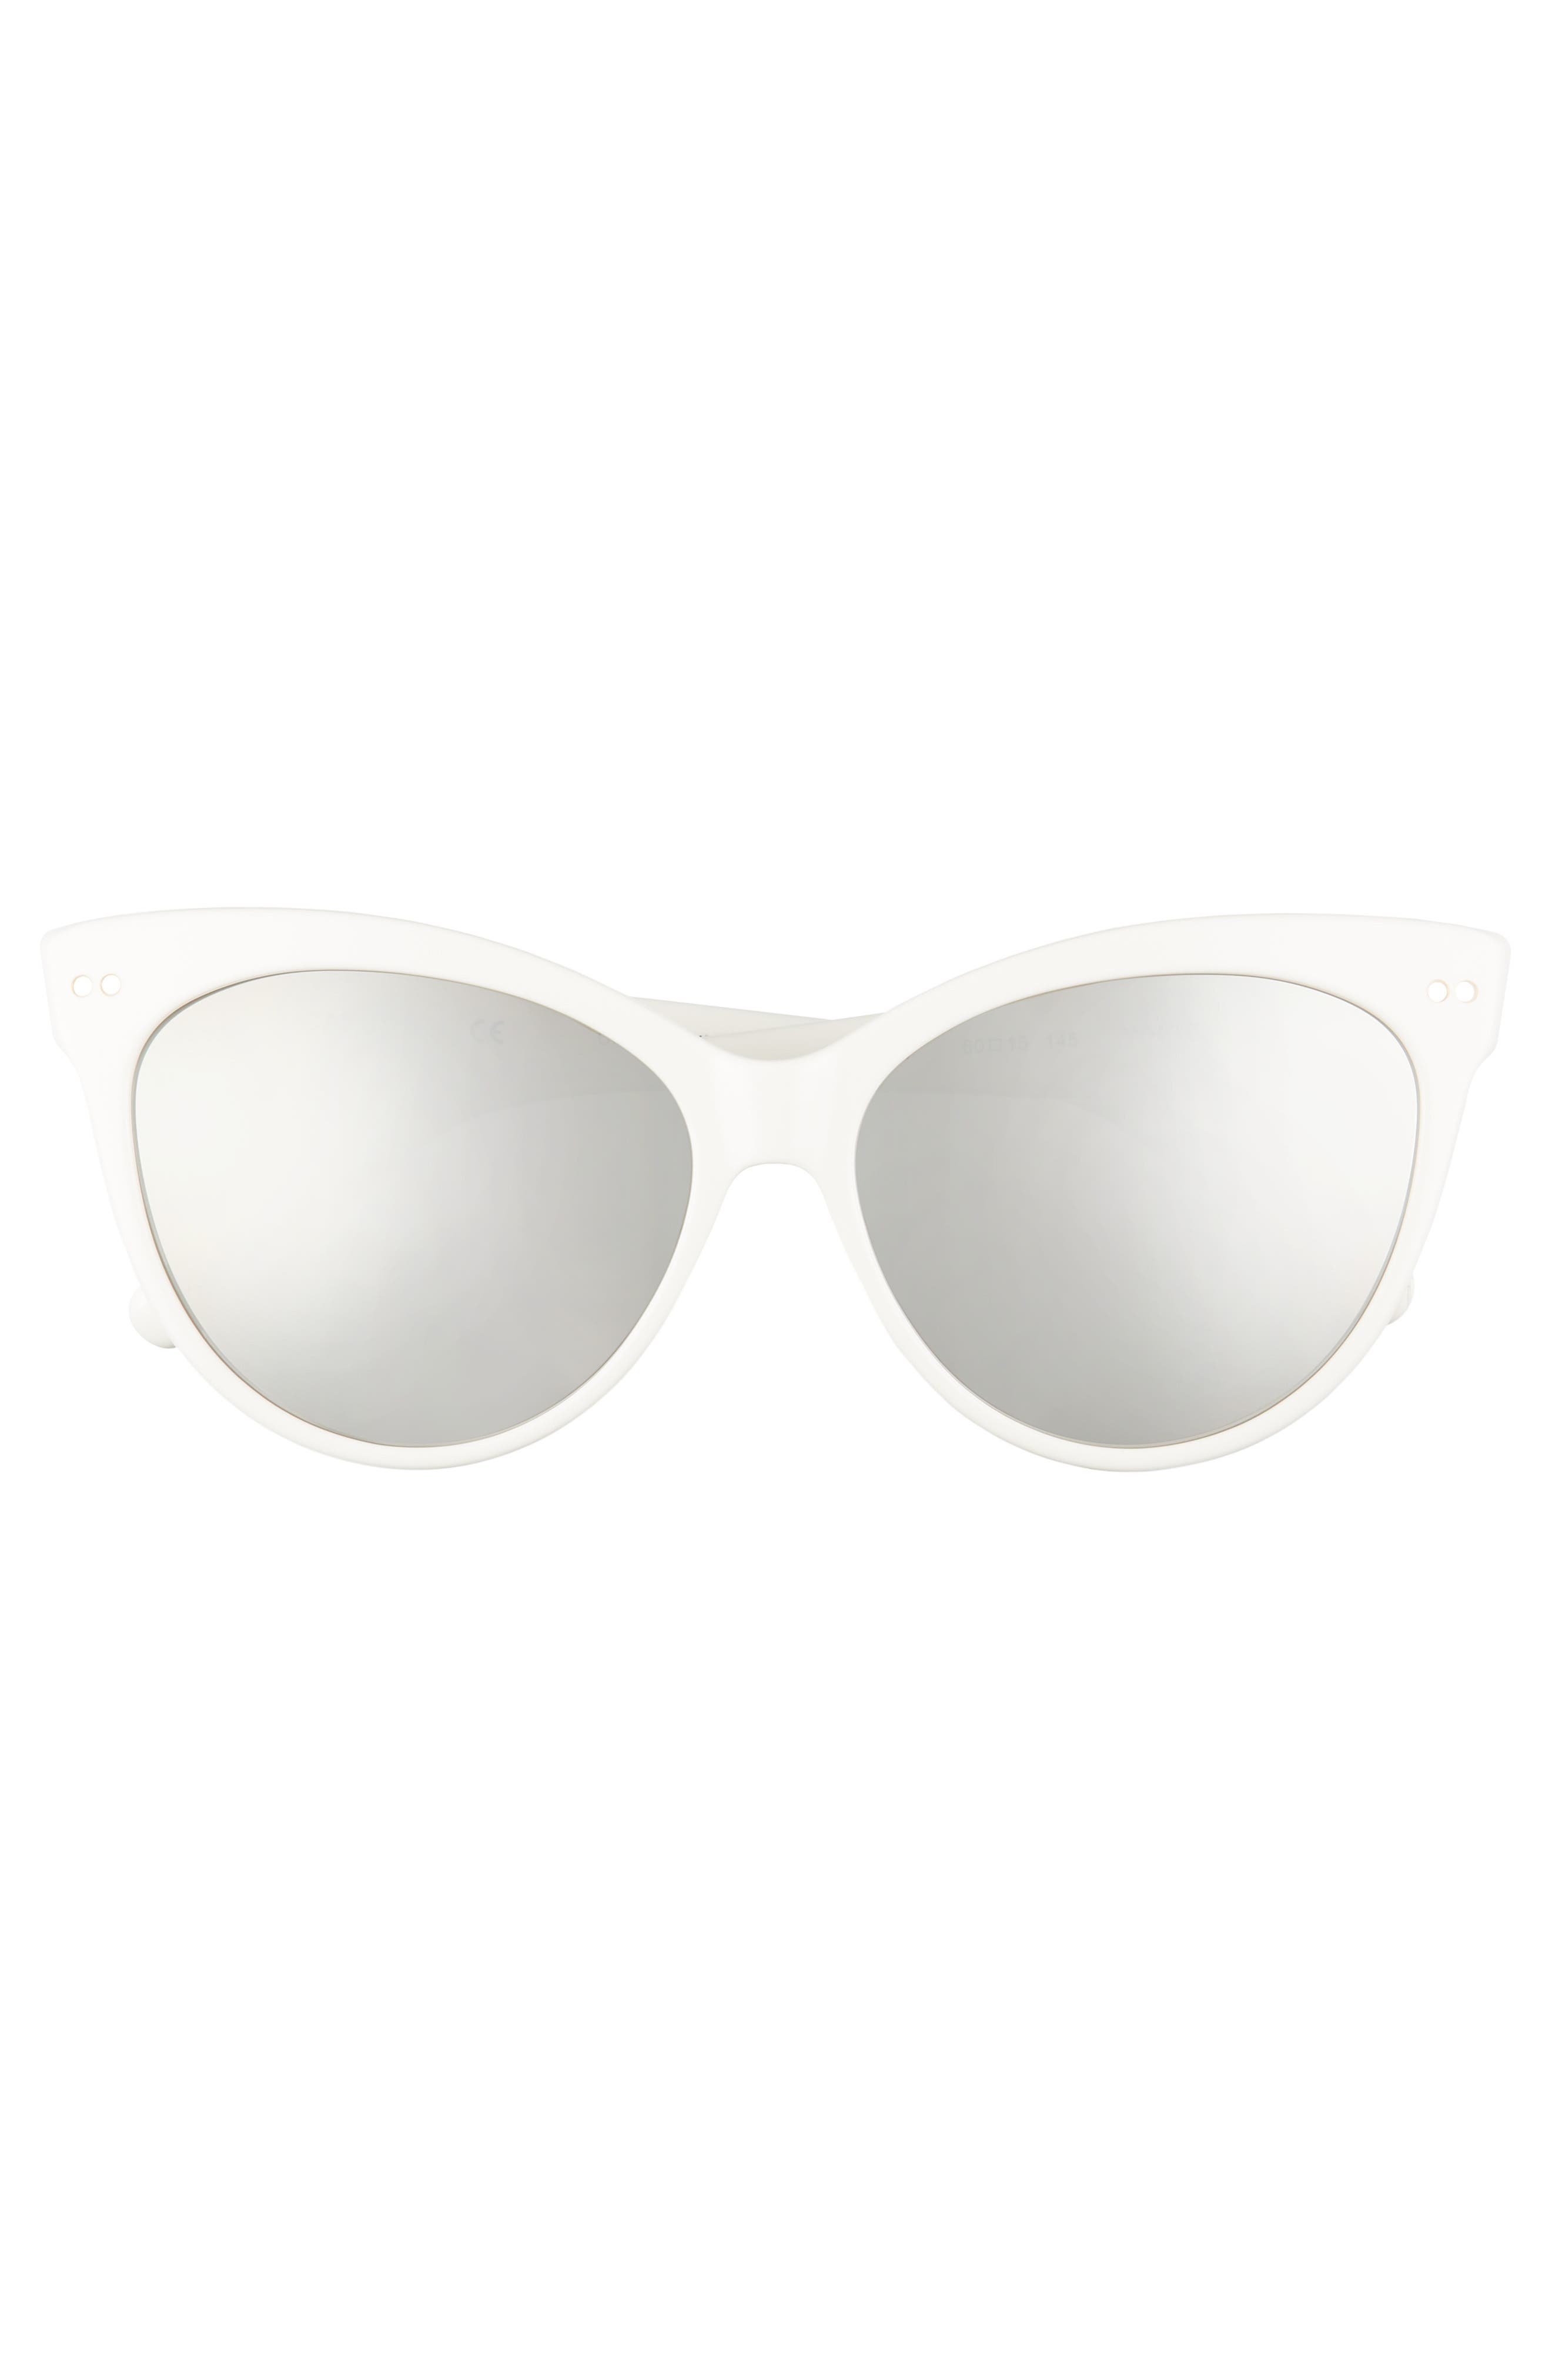 Audrey 60mm Cat Eye Sunglasses,                             Alternate thumbnail 3, color,                             WHITE